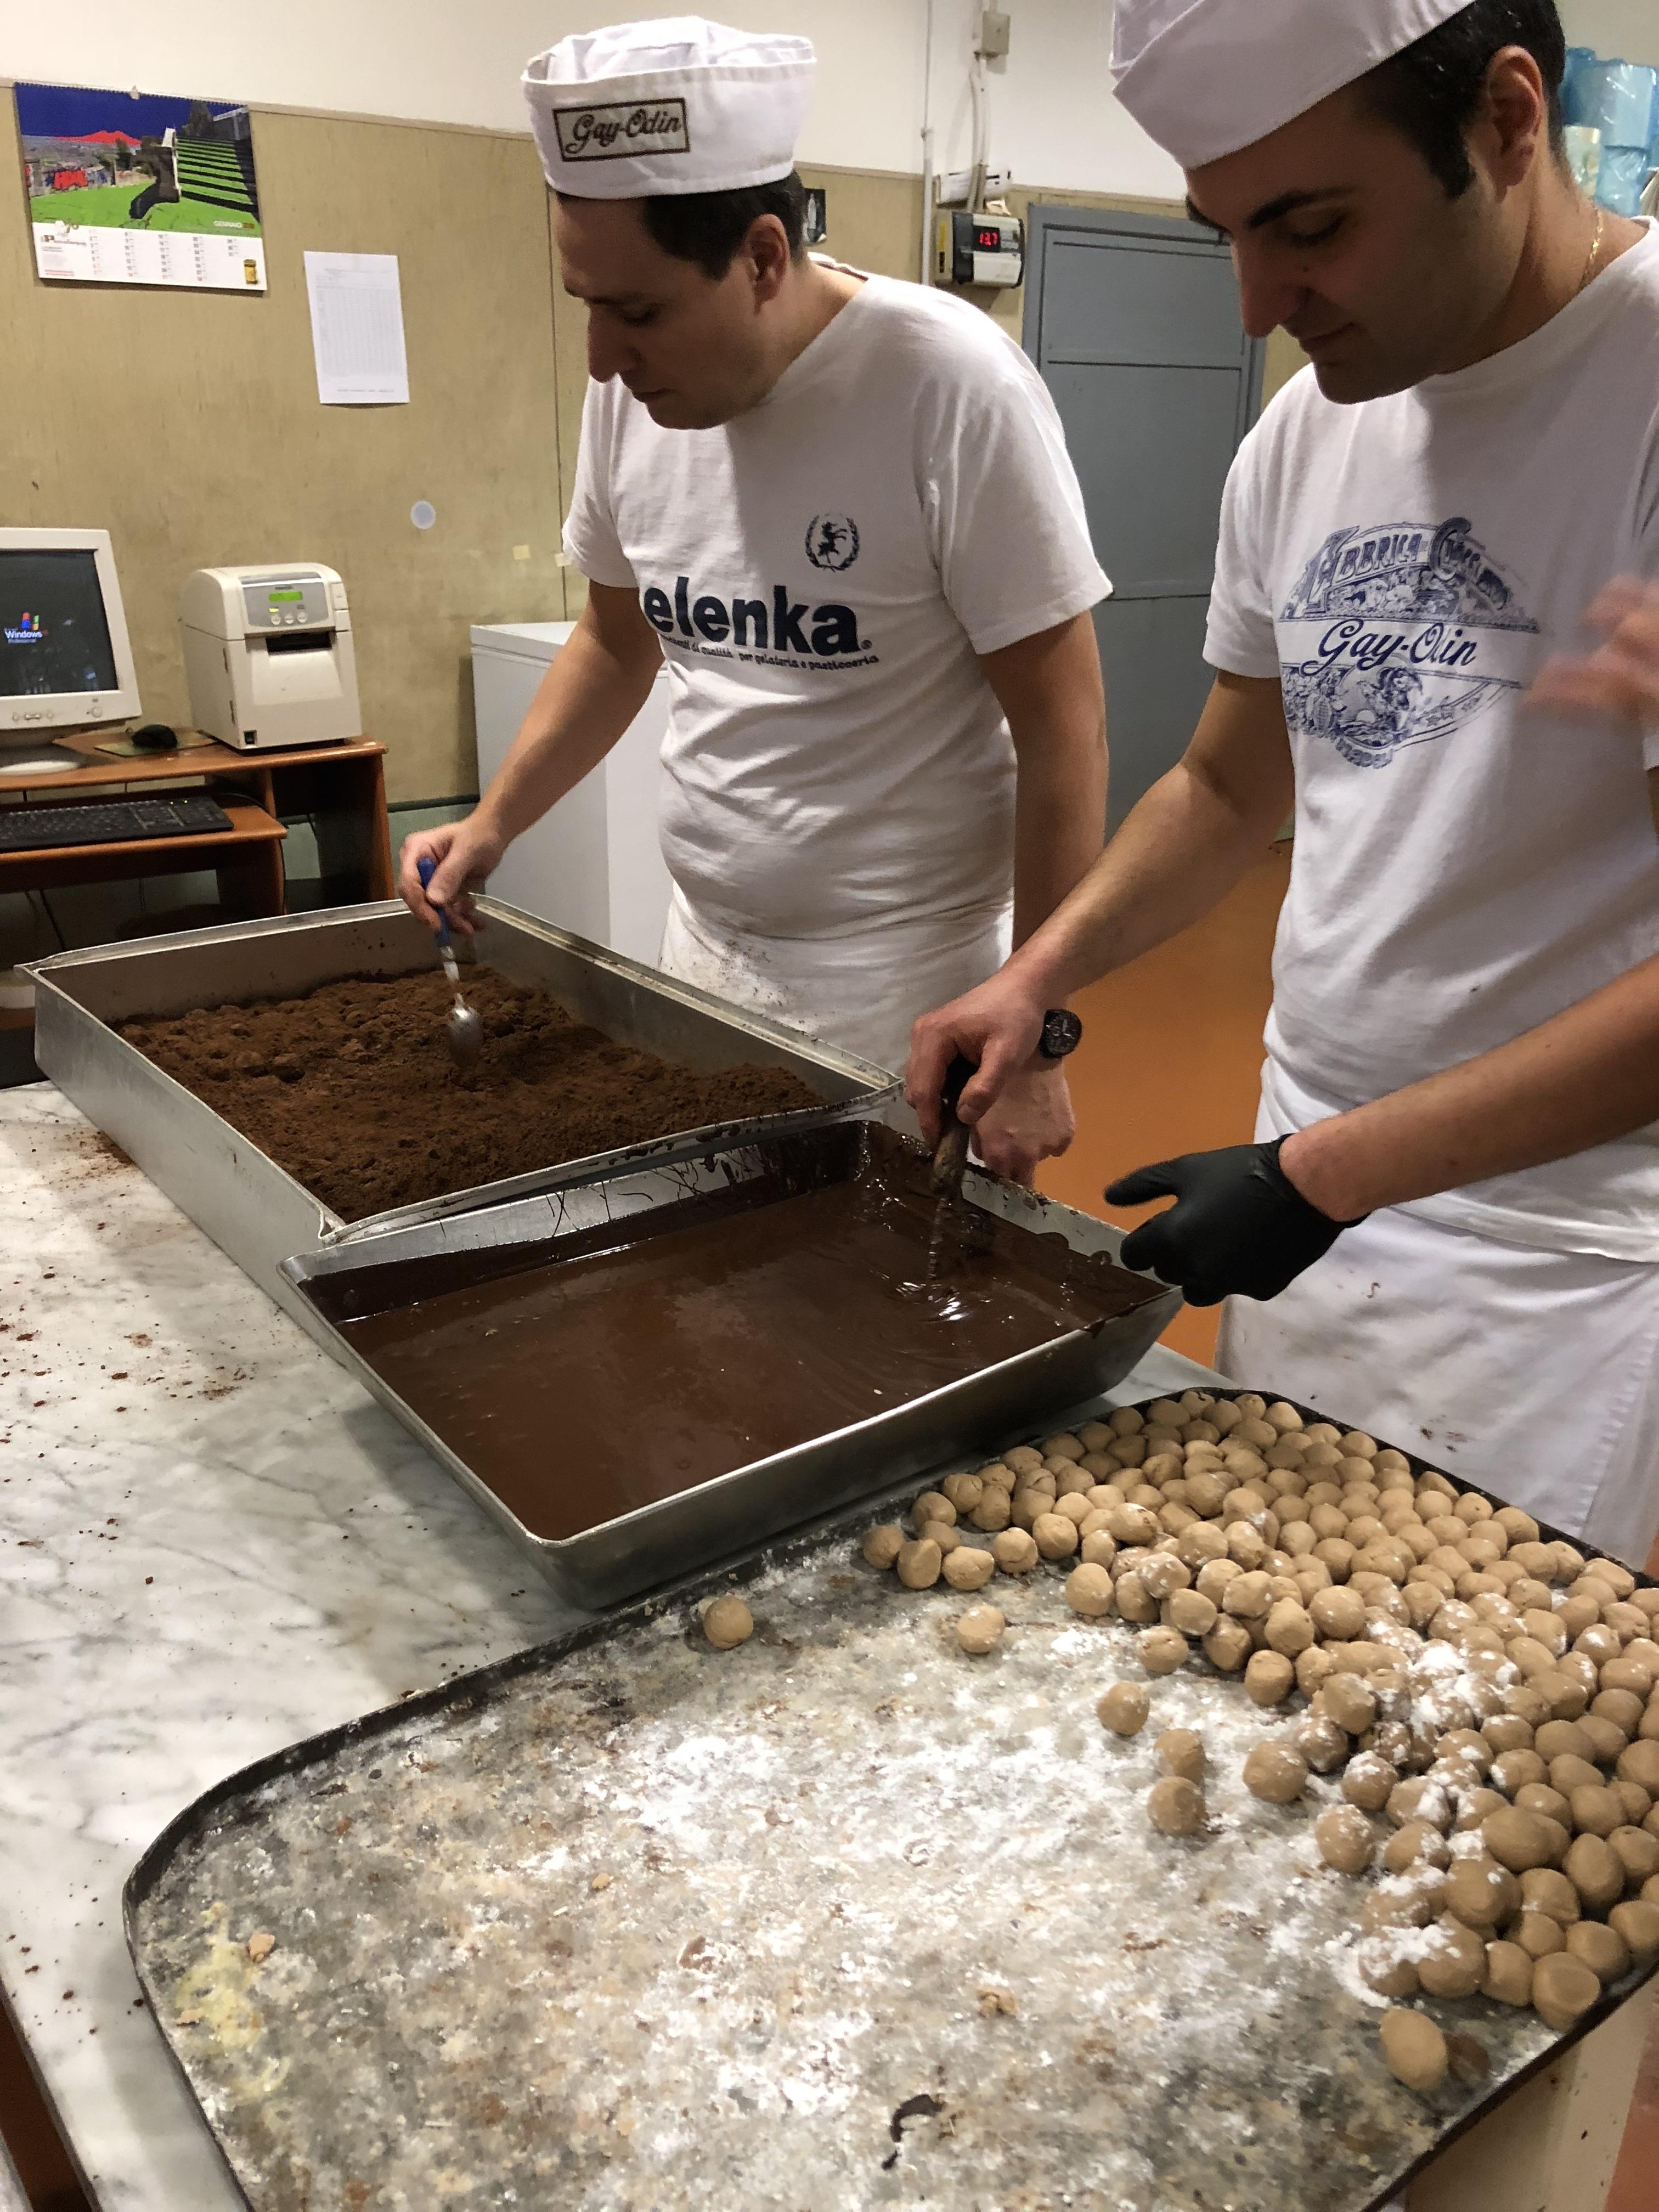 Napoli il pane e le rose Talpa produzioni 2018